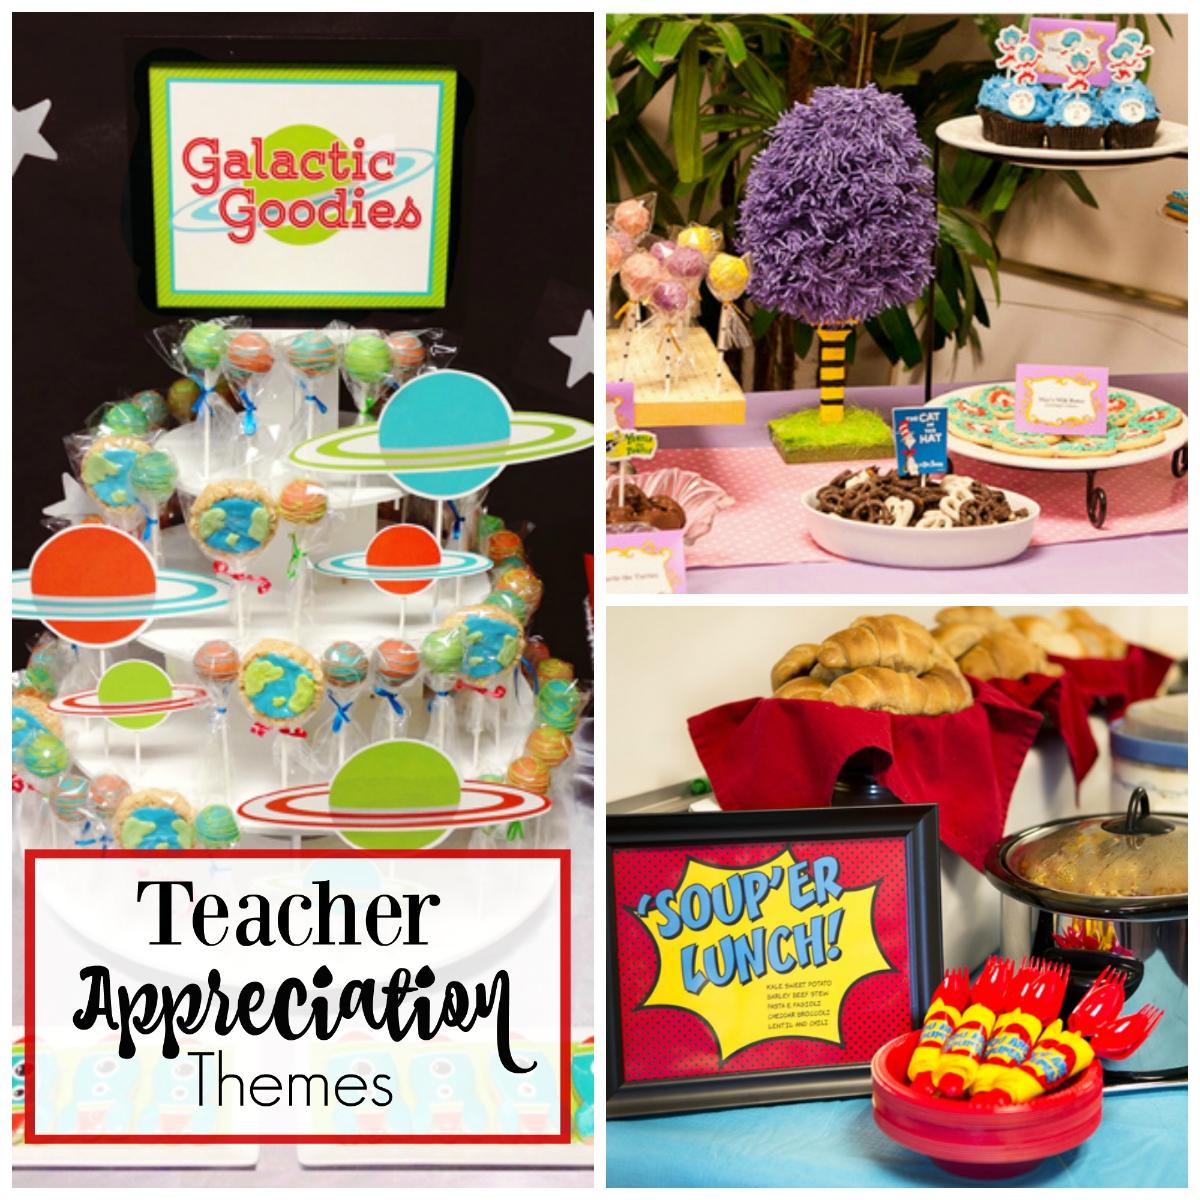 10 Famous Ideas For Teacher Appreciation Week fun teacher appreciation week ideas fun squared 3 2020